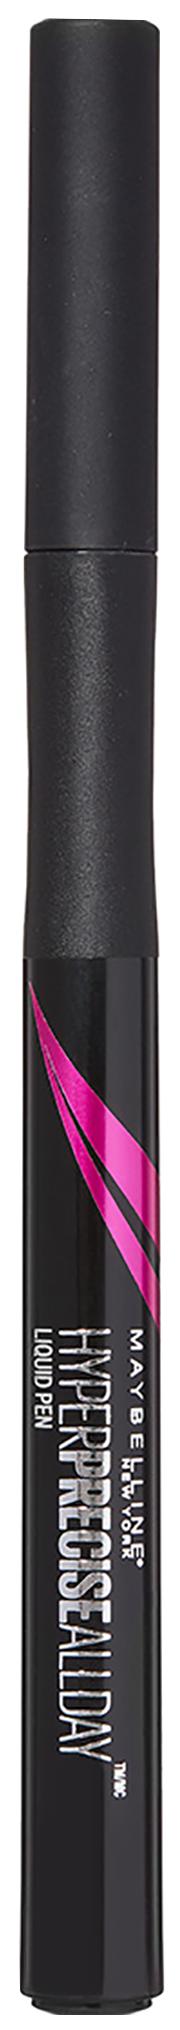 Купить Подводка для глаз Maybelline Hyper Precise All Day Liquid Pen, Maybelline New York